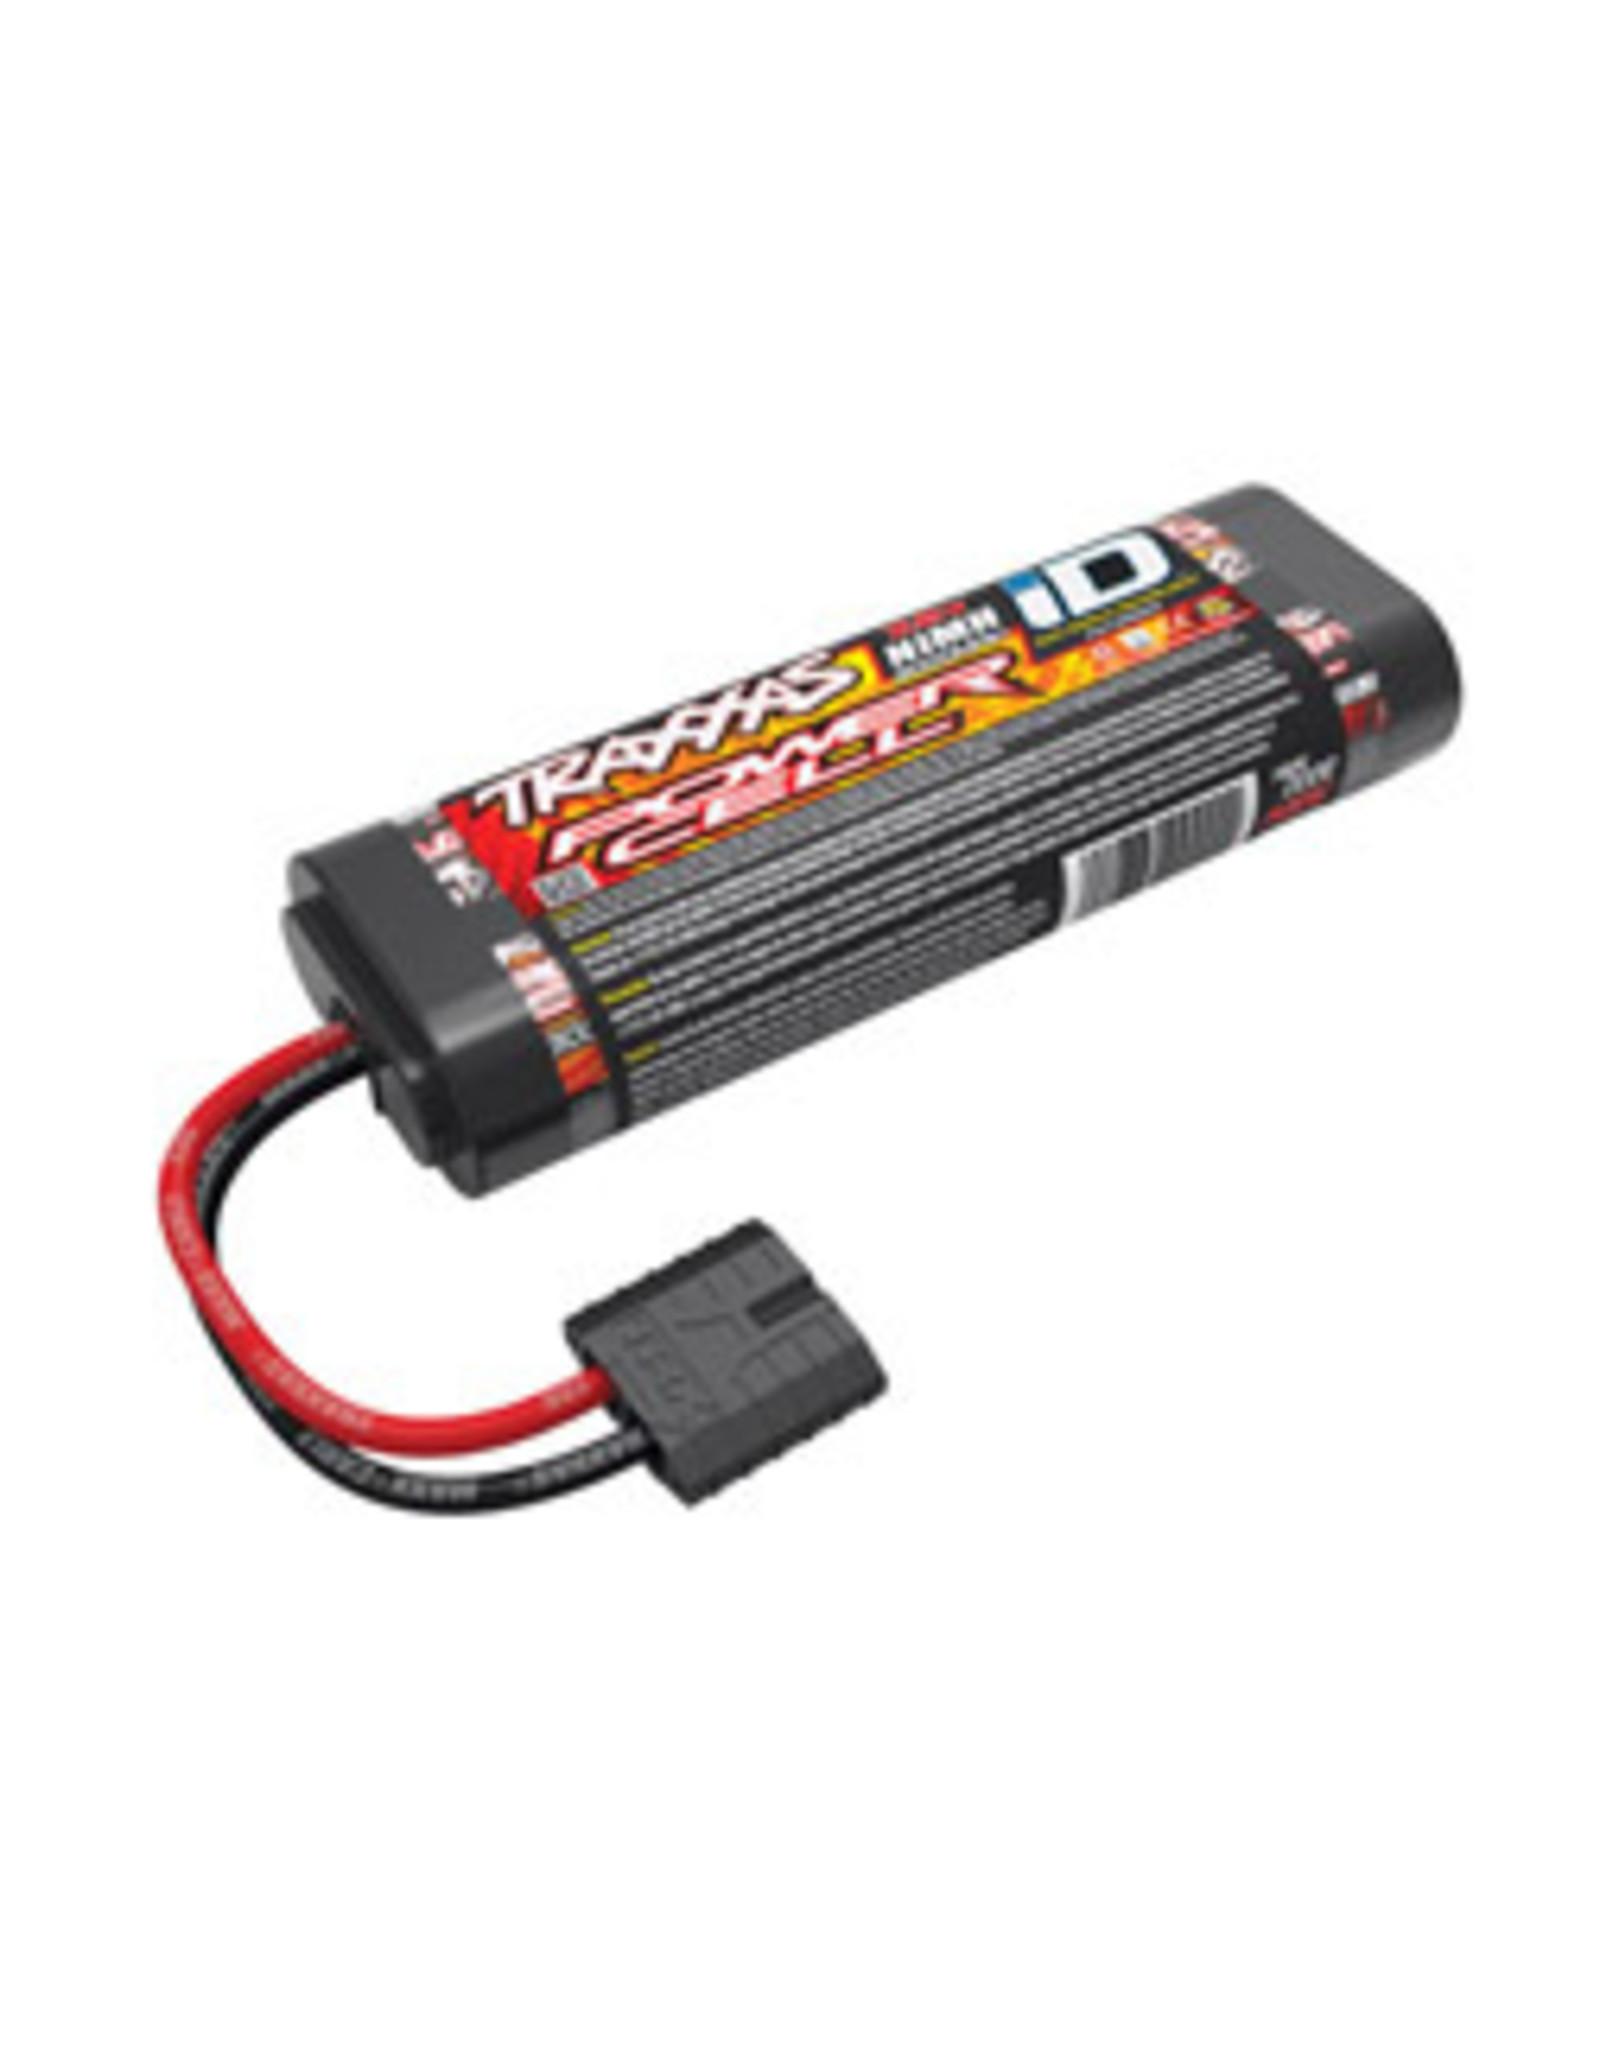 Traxxas Battery, Power Cell, 3000mAh (NiMH, 6-C flat, 7.2V)(2922X) BLAST